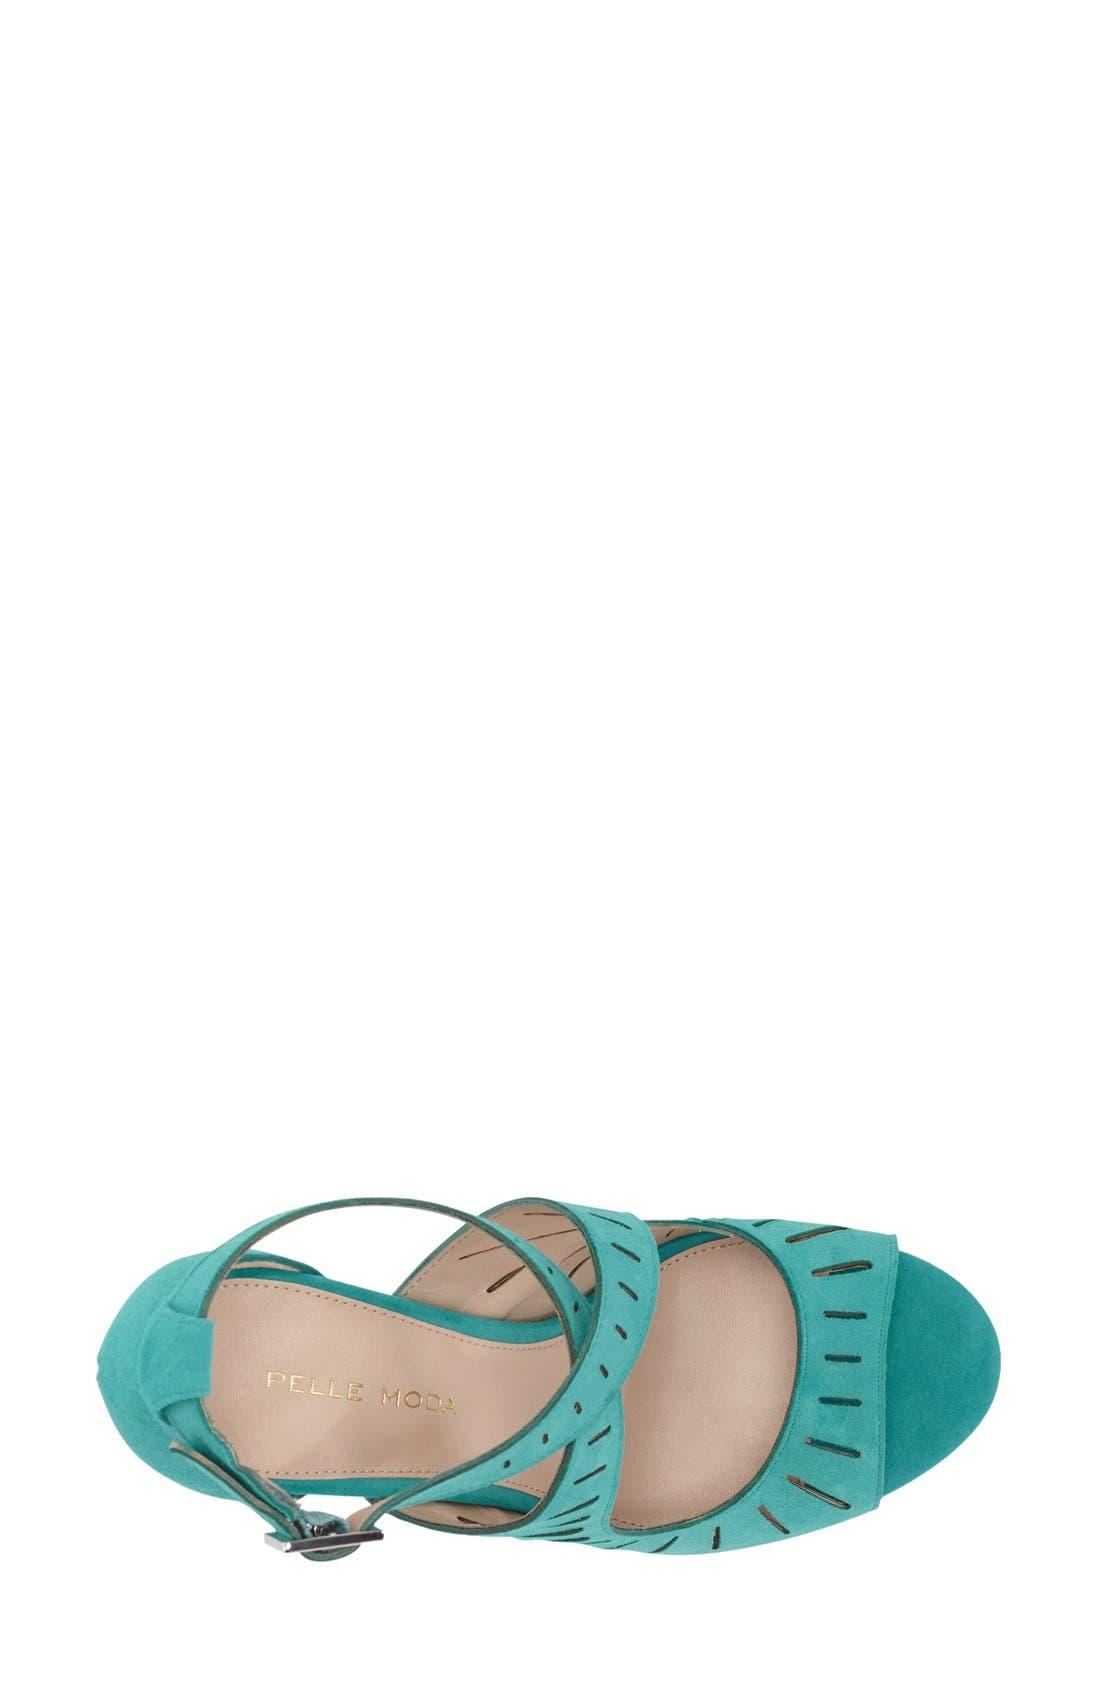 Alternate Image 3  - Pelle Moda 'Menlo' Cutout Sandal (Women)